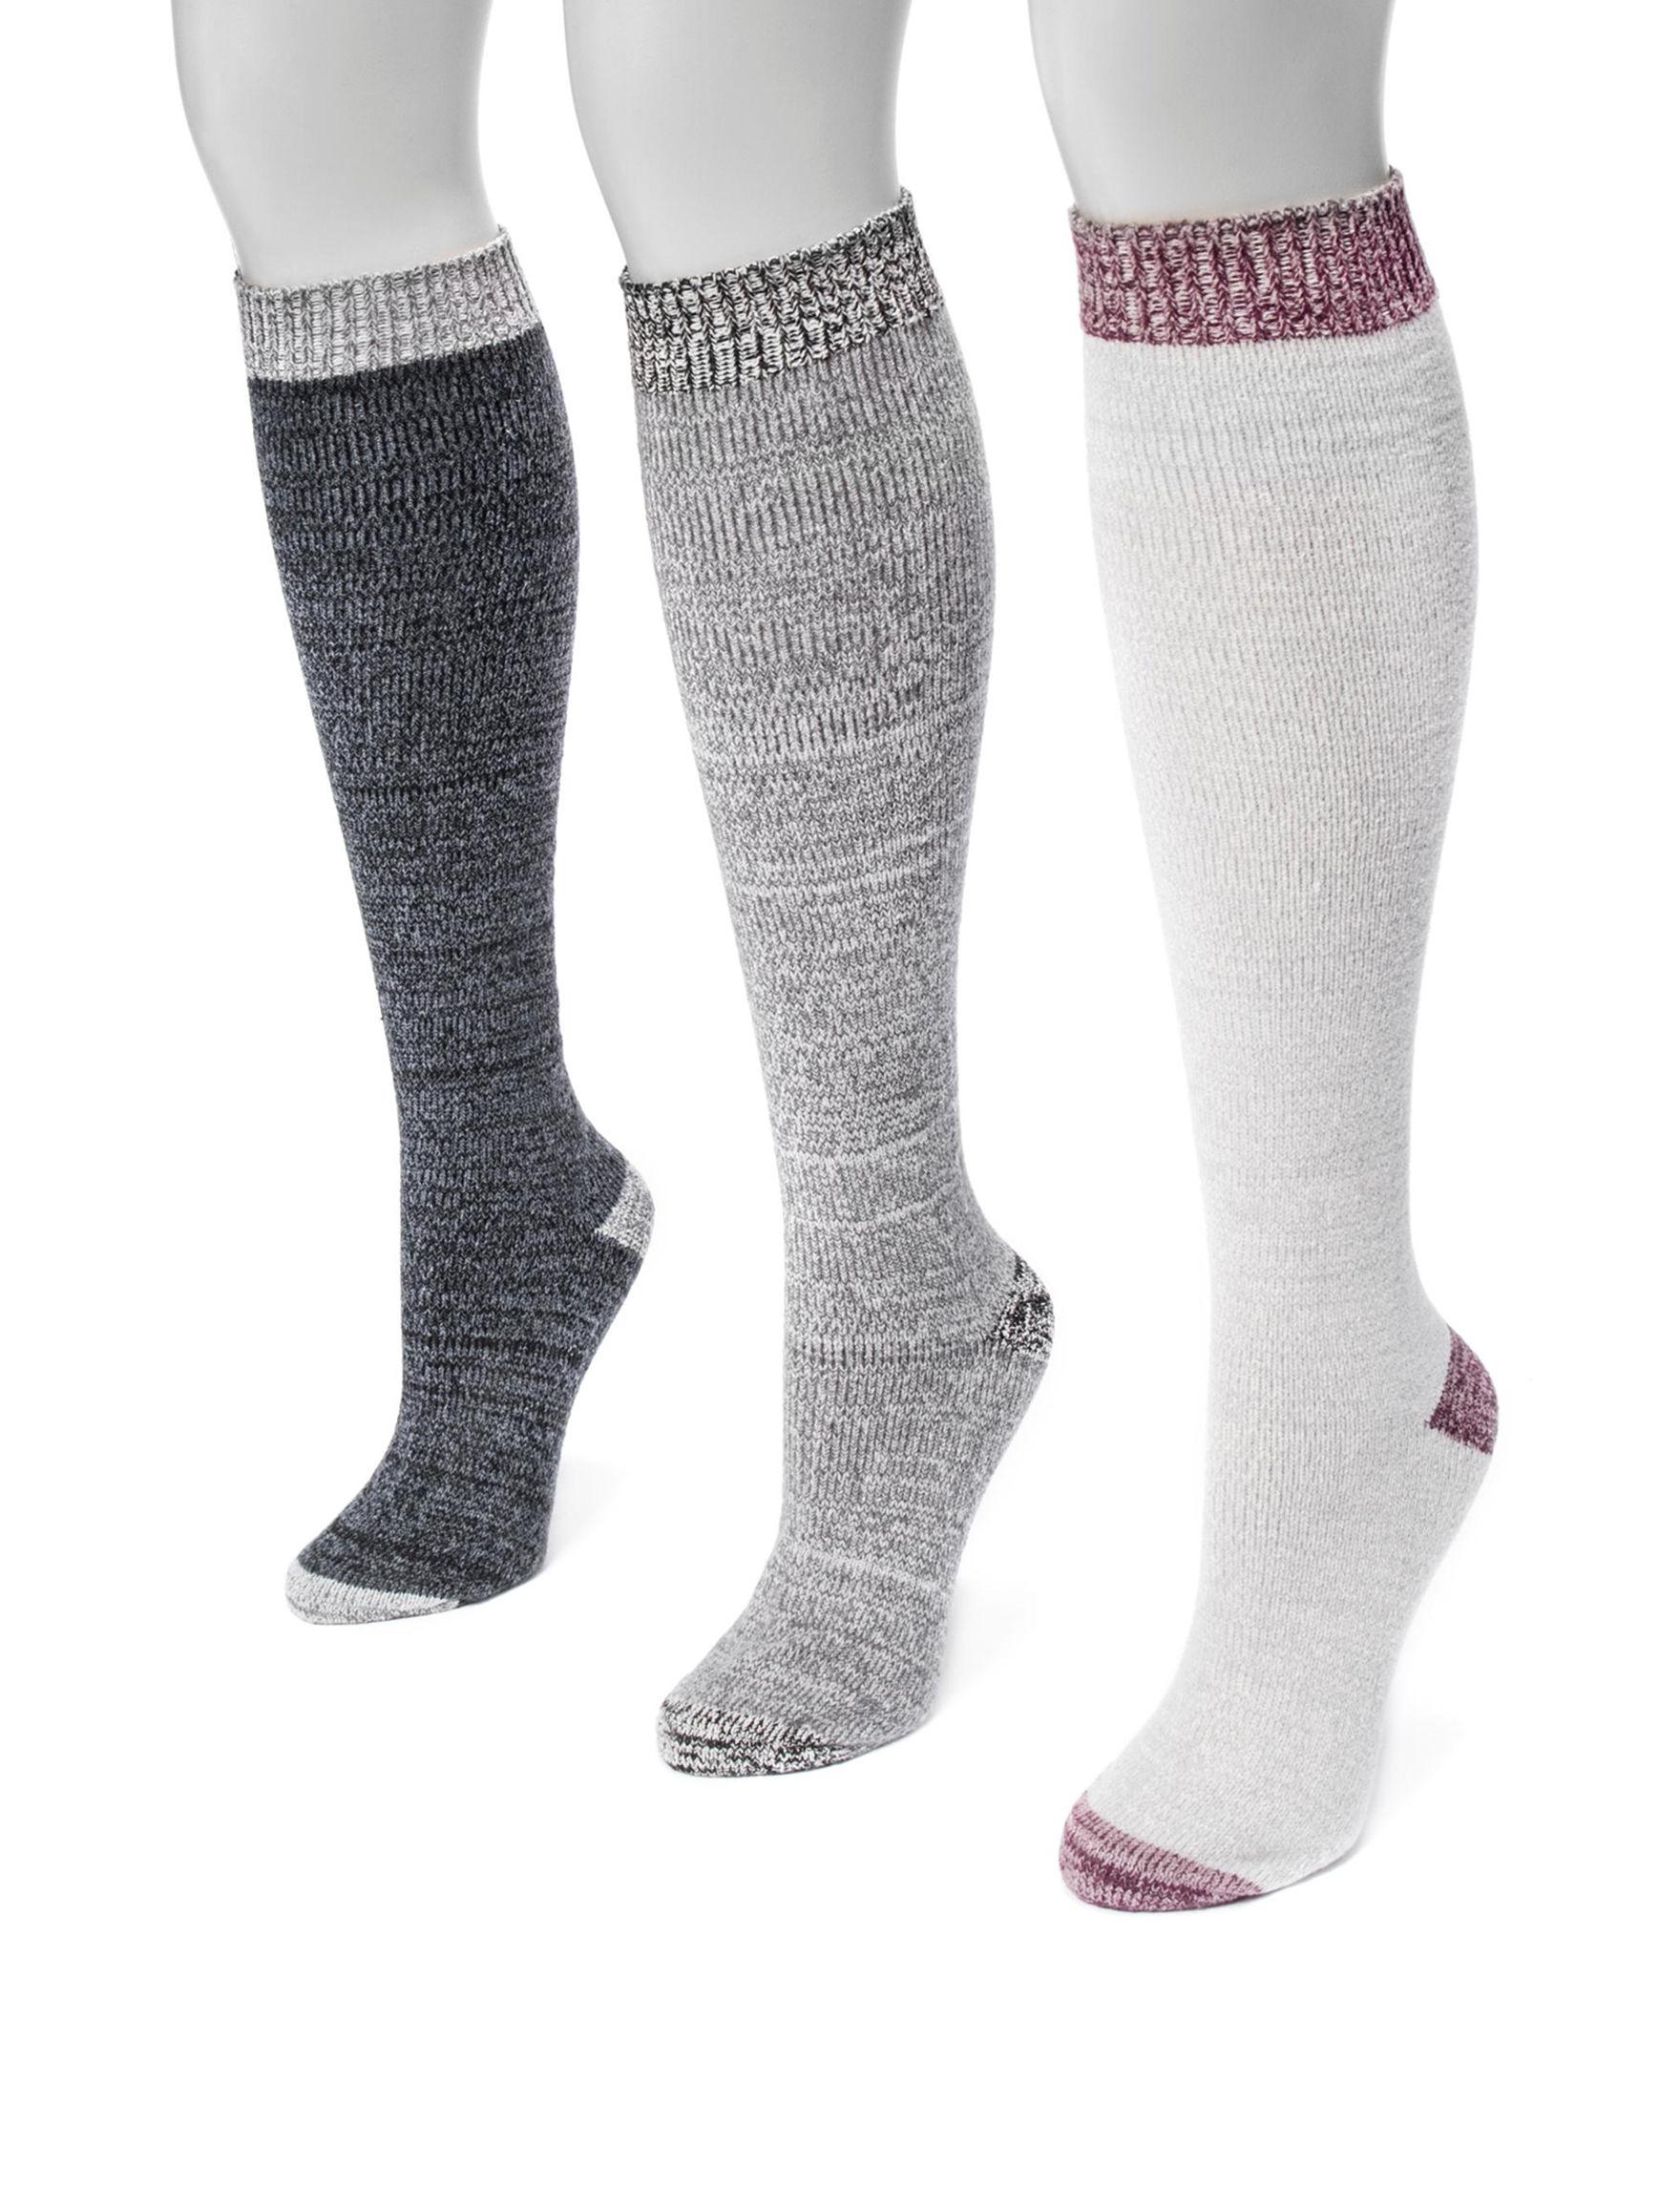 Muk Luks Black Multi Socks